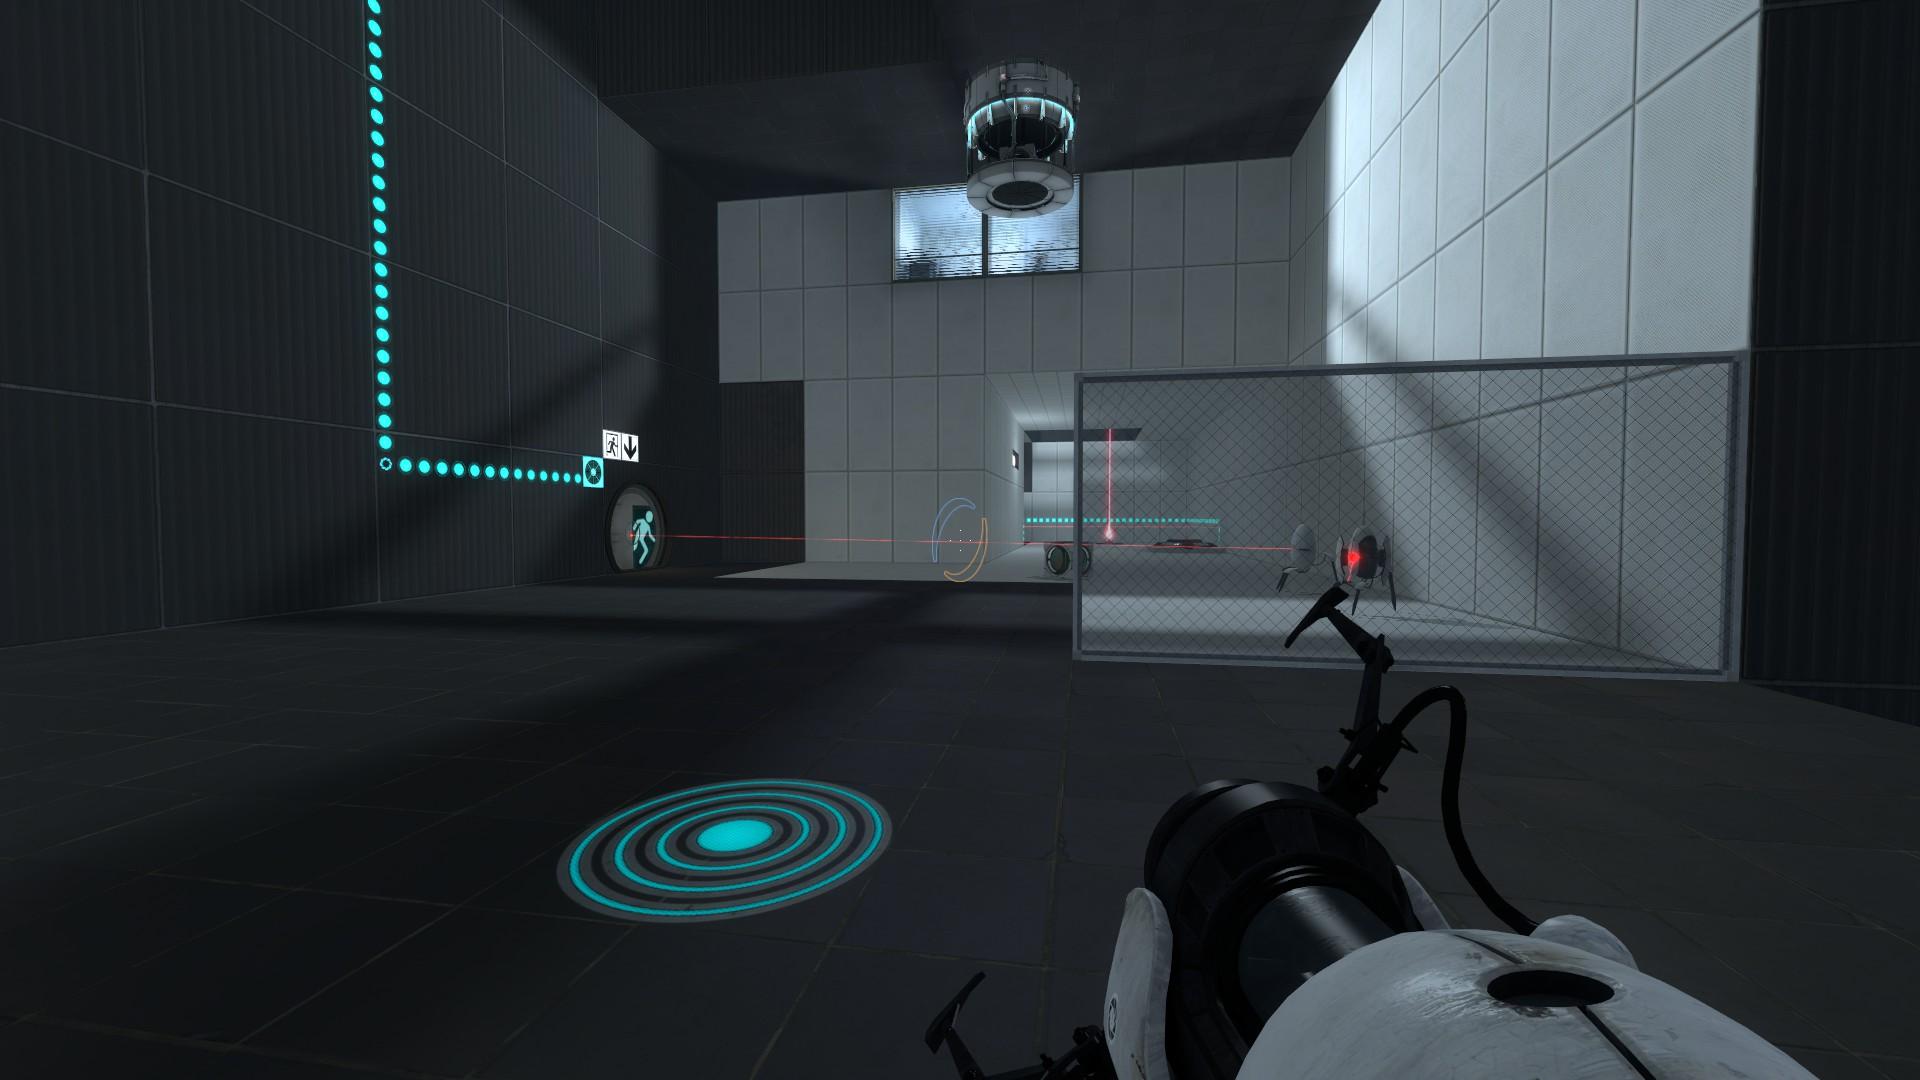 Portal 2: Perpetual Testing Initiative [Impresiones]